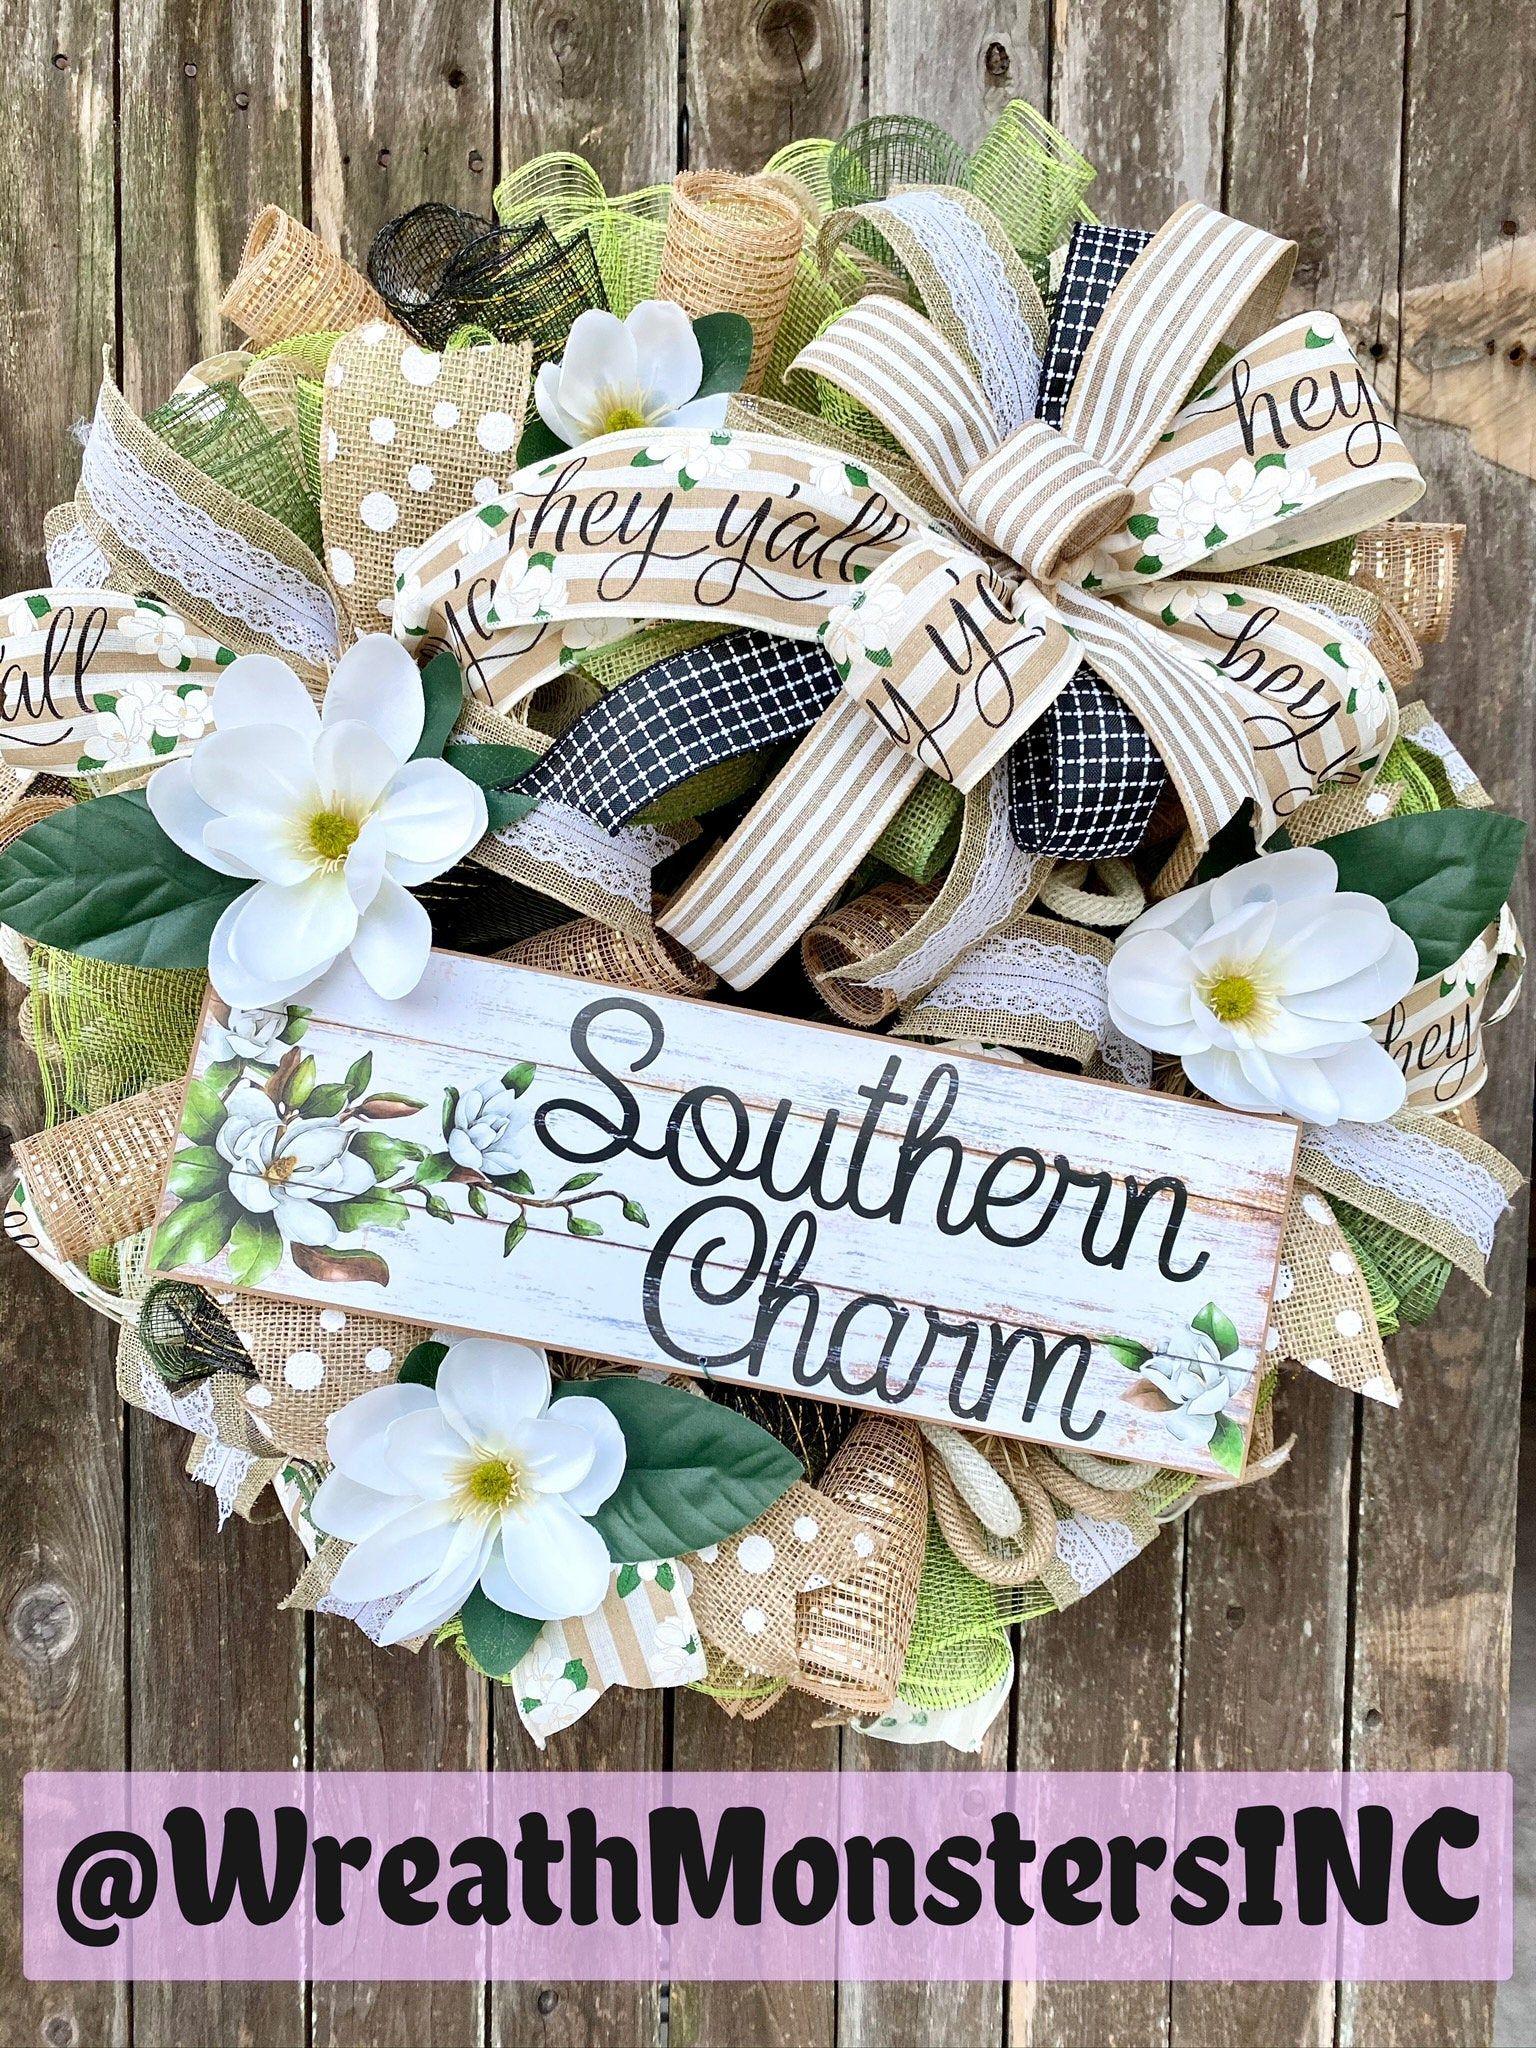 Photo of Southern Charm Magnolia Wreath, Magnolia Wreath, Burlap and White Magnolia Wreath, Southern Wreath, Farmhouse Wreath